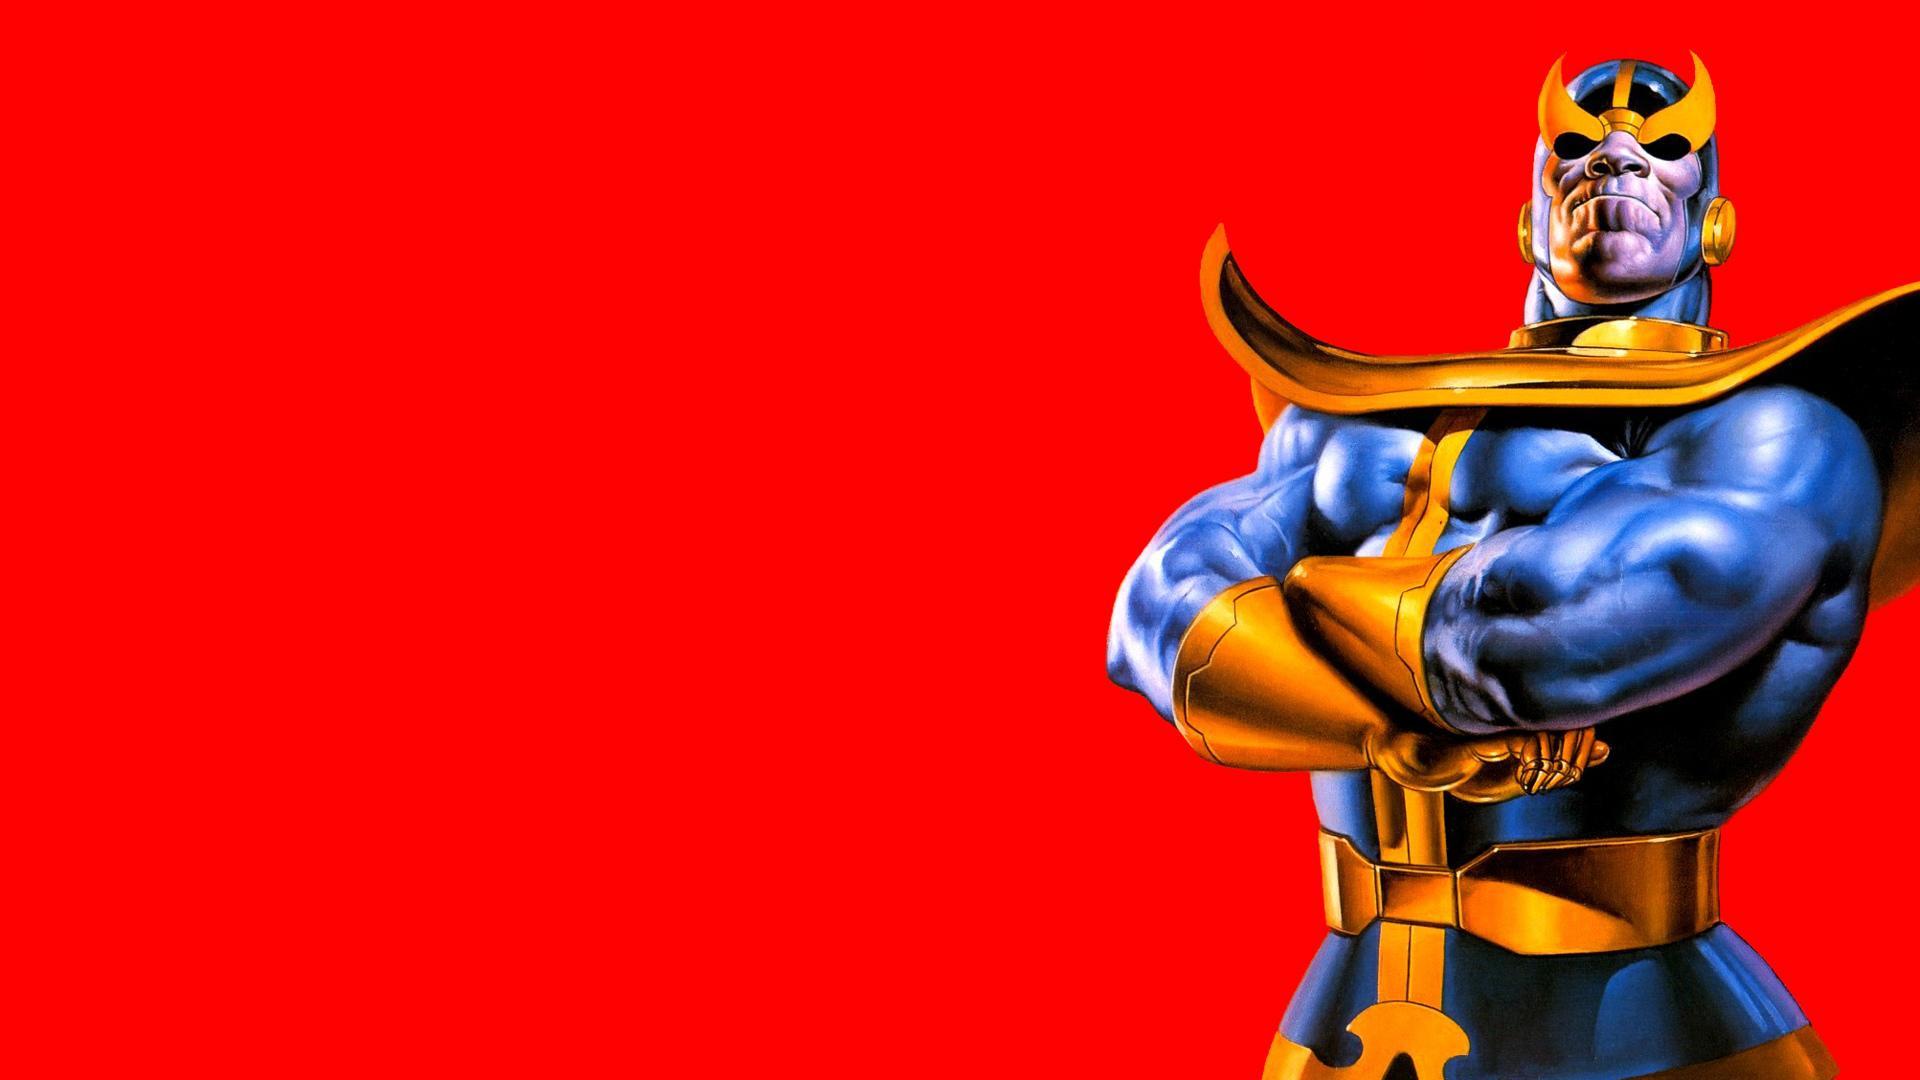 Thanos Comics wallpapers HD quality